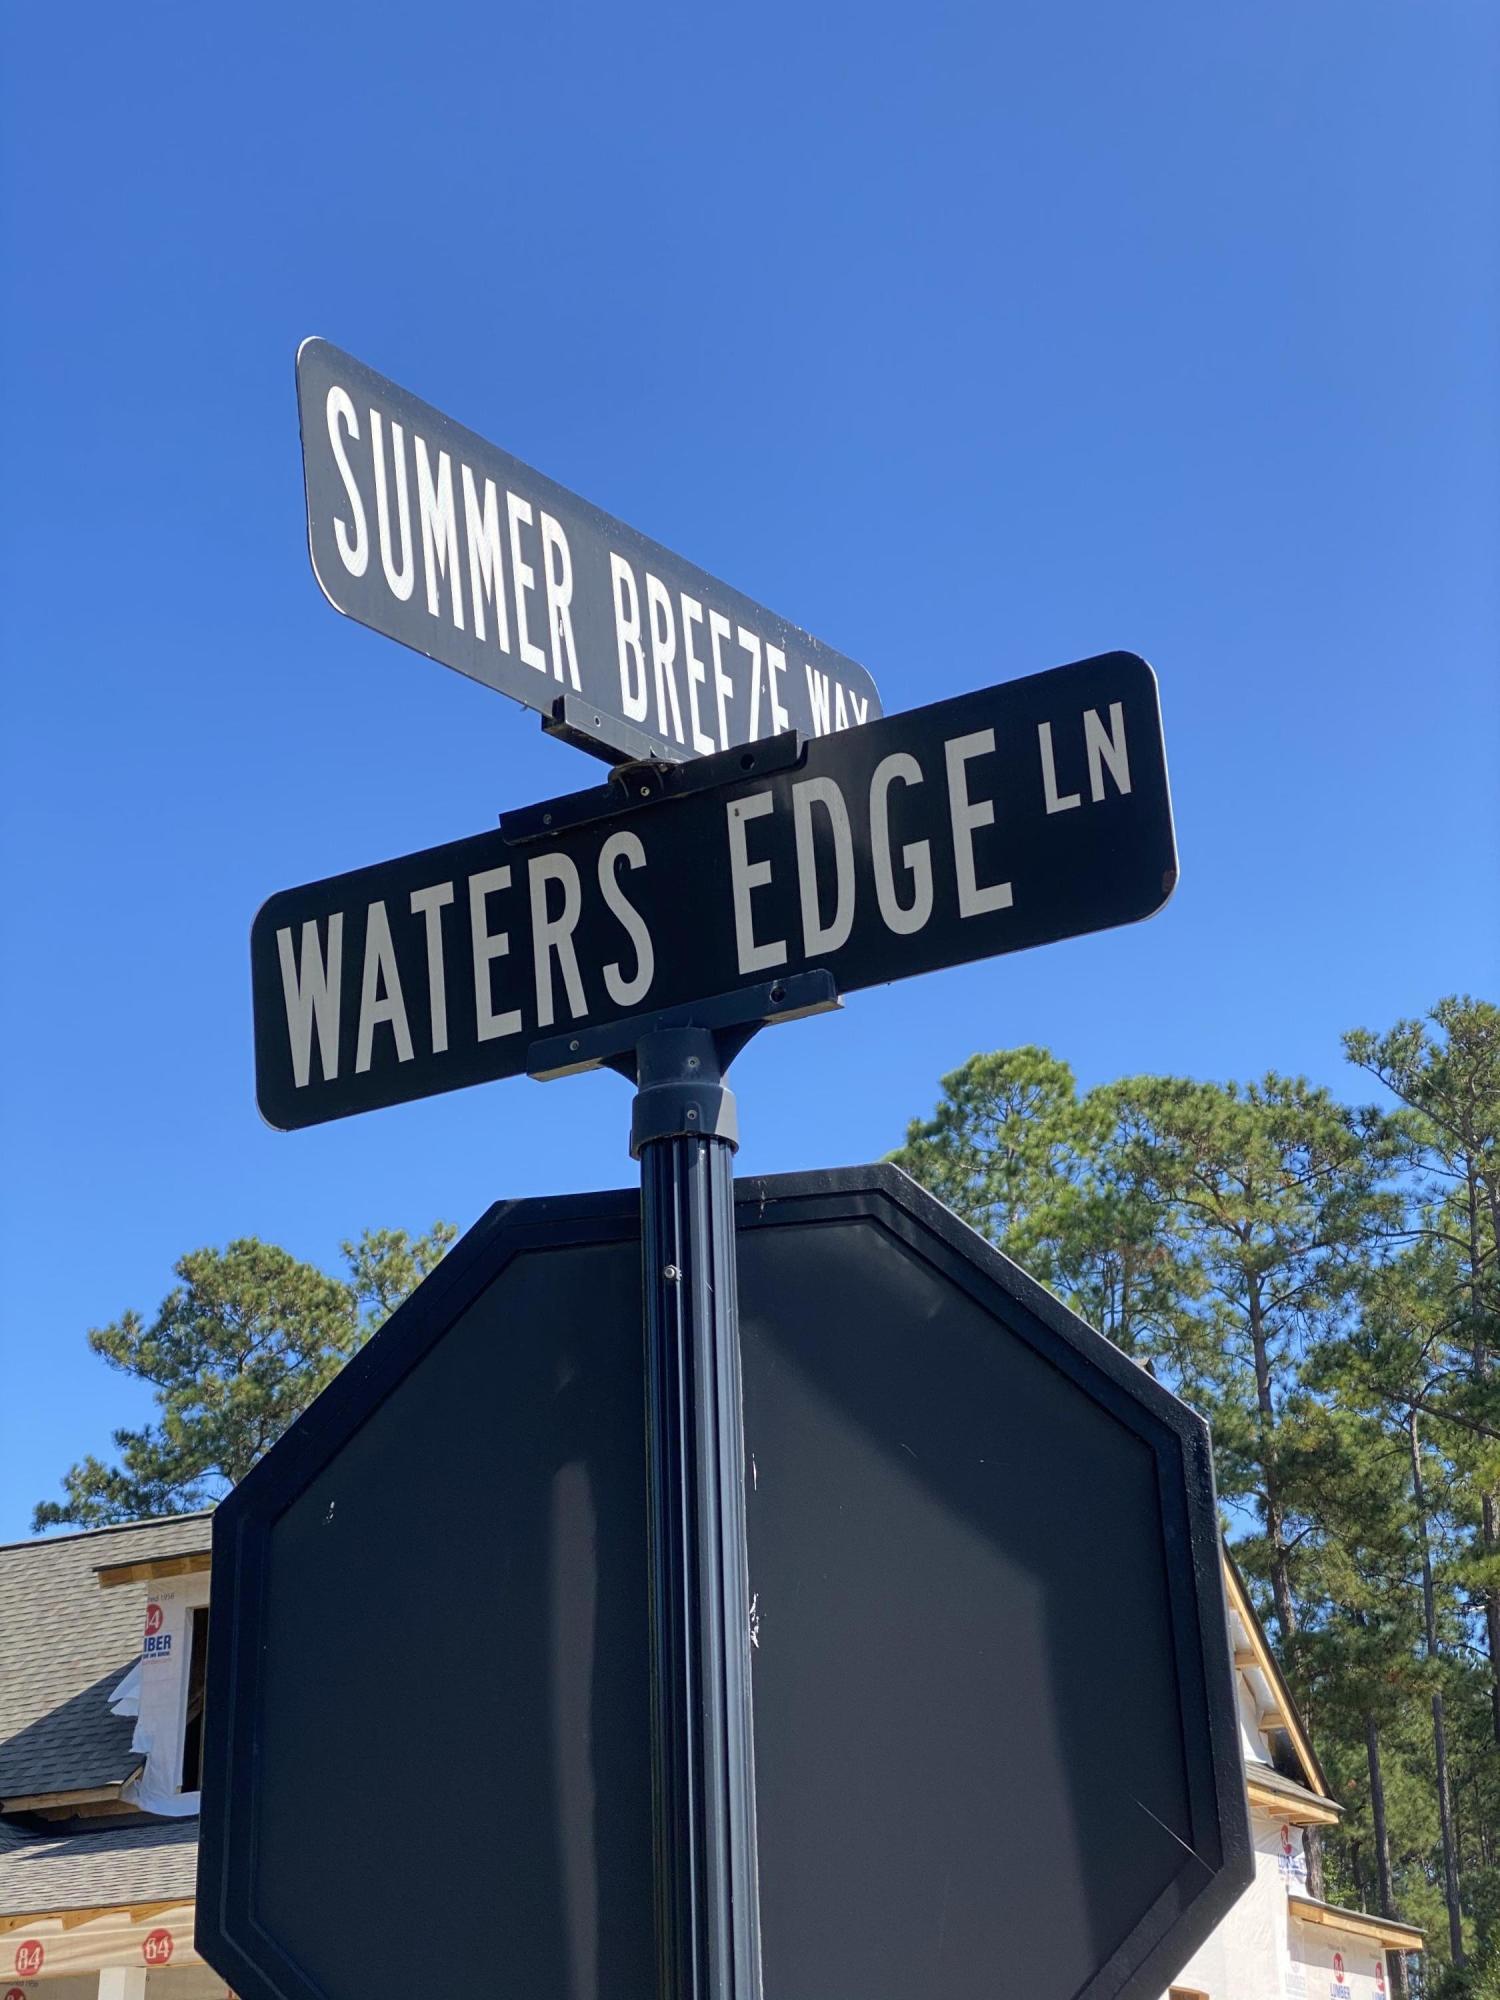 112 Waters Edge Lane Moncks Corner, SC 29461